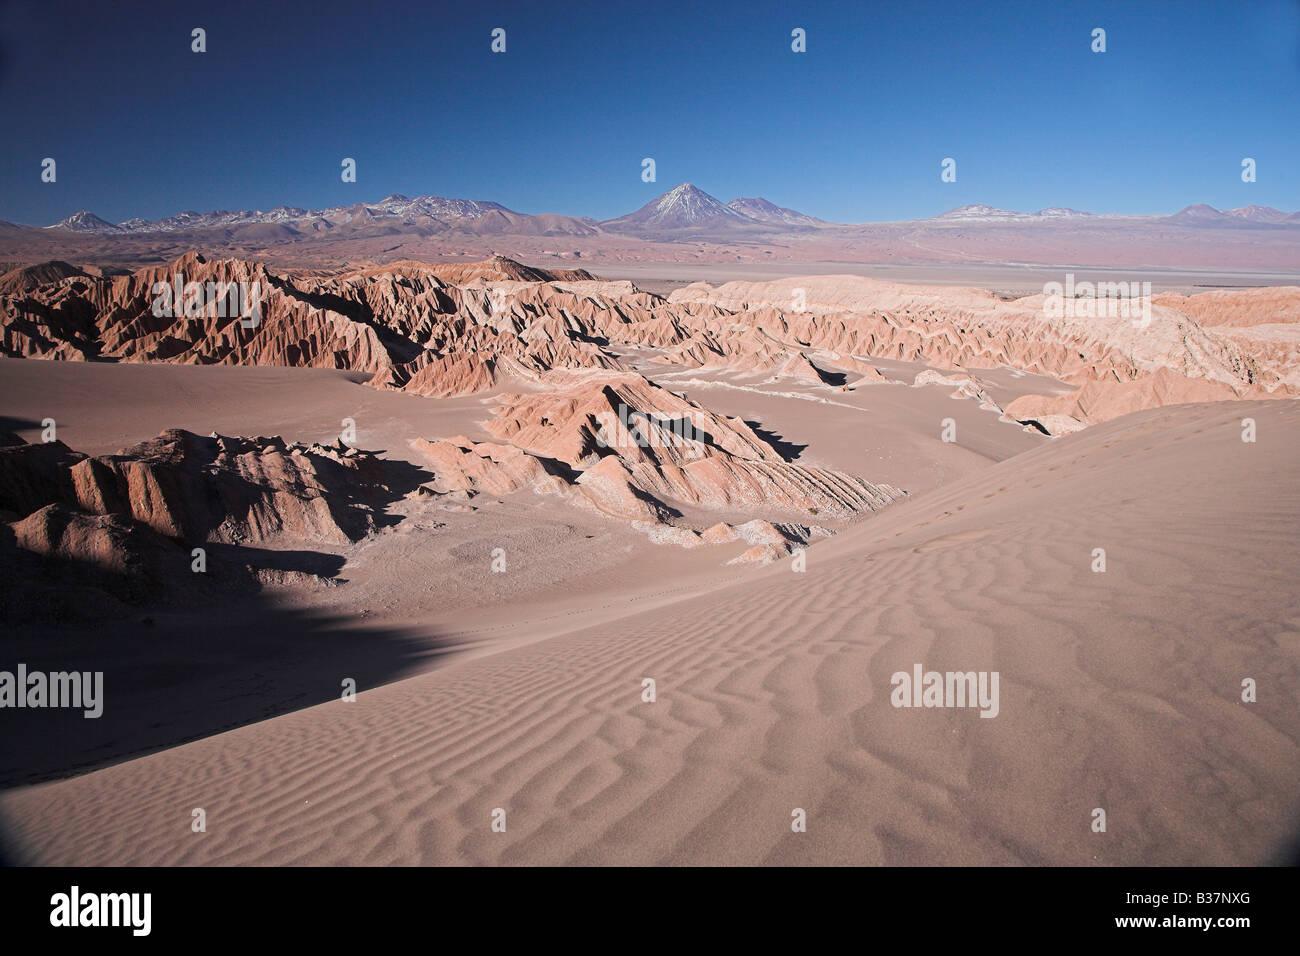 Valle de la Luna and the Atacama desert in San Pedro de Atacama in northern Chile. - Stock Image